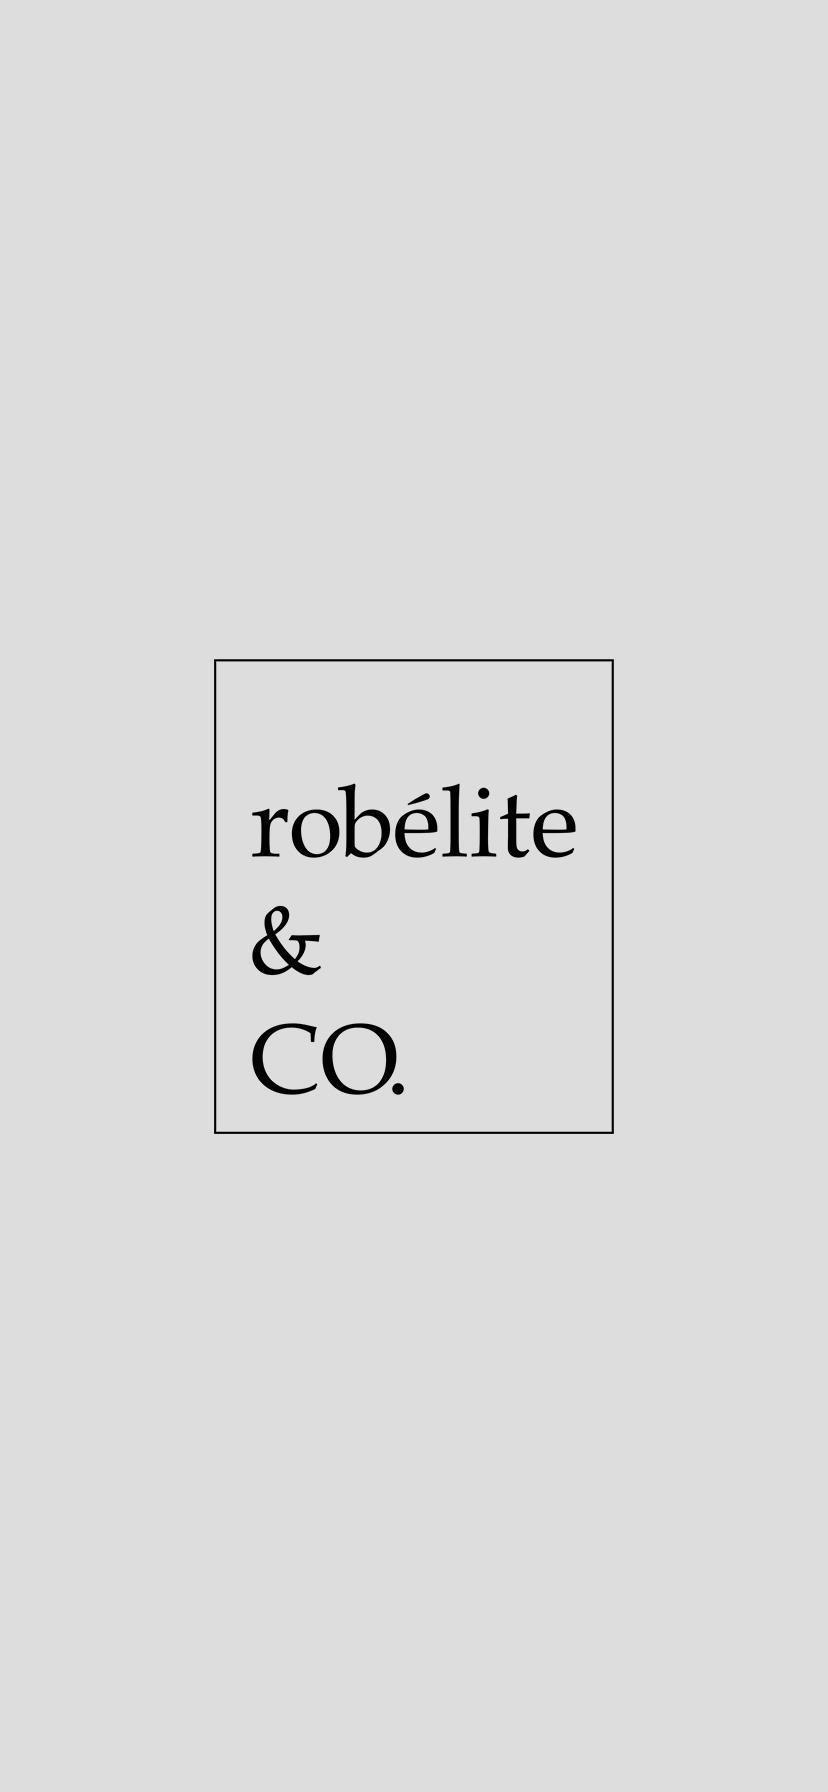 robelite&CO